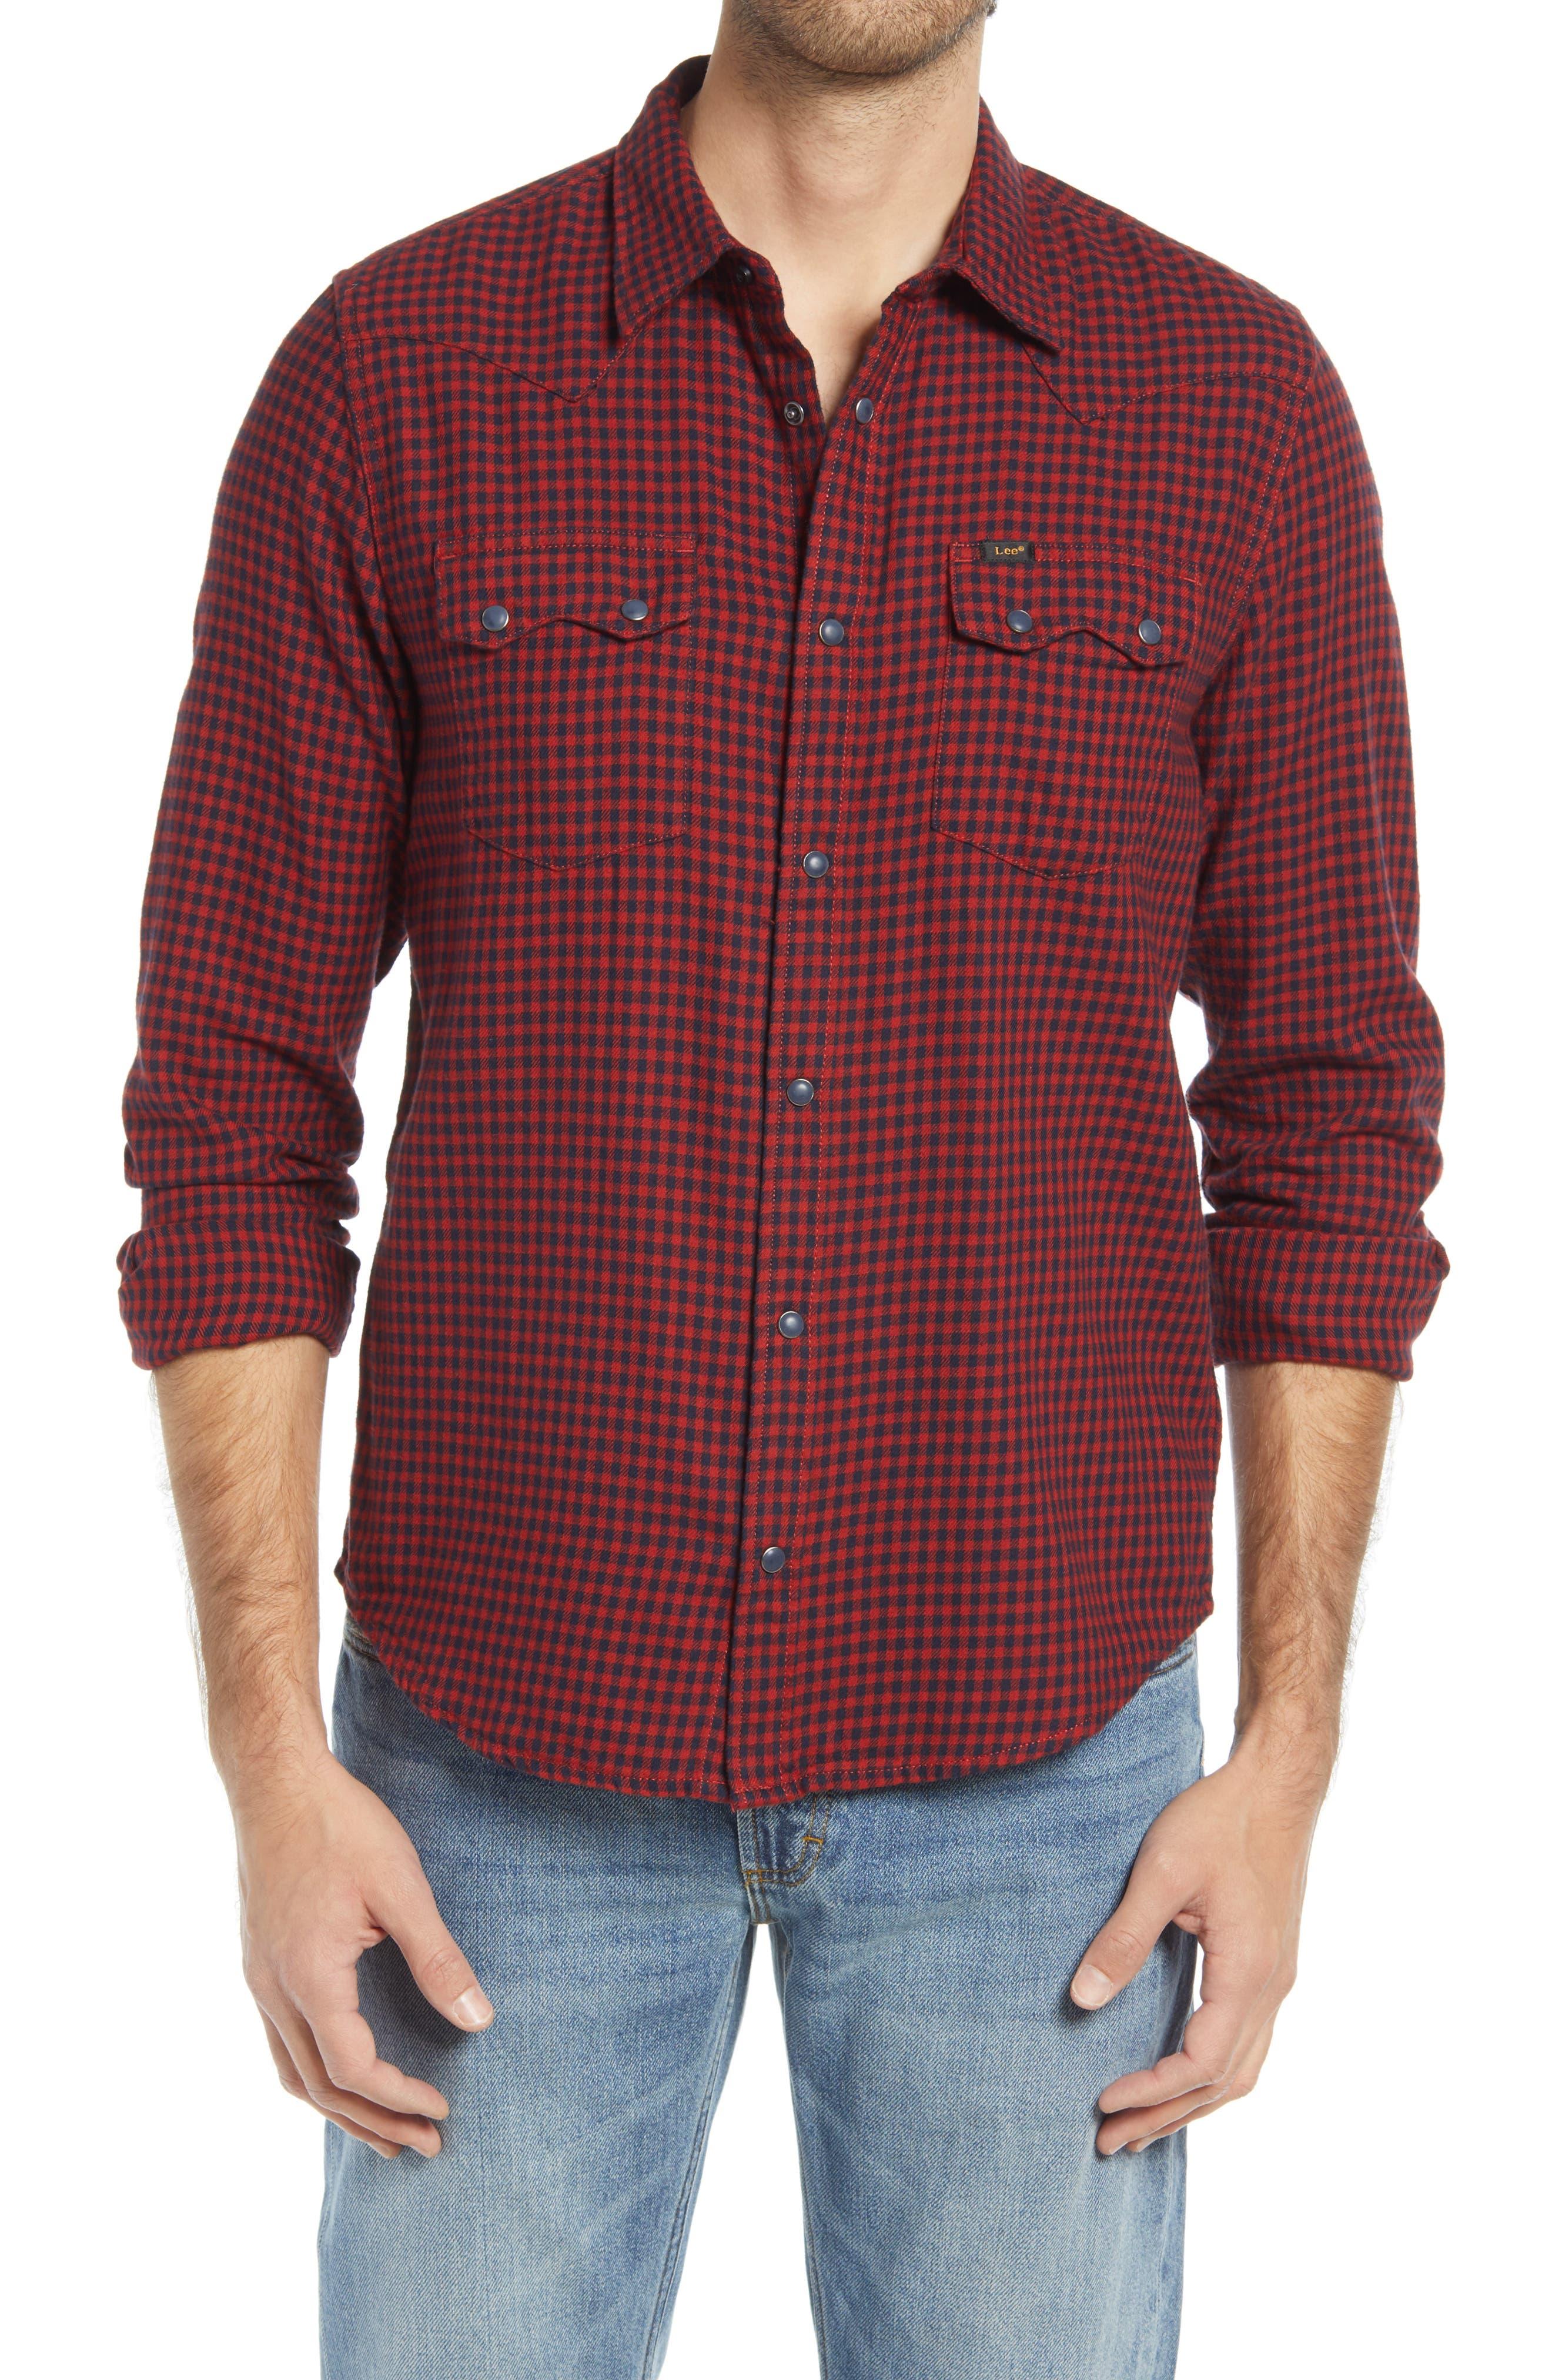 Rider Plaid Flannel Button-Up Shirt